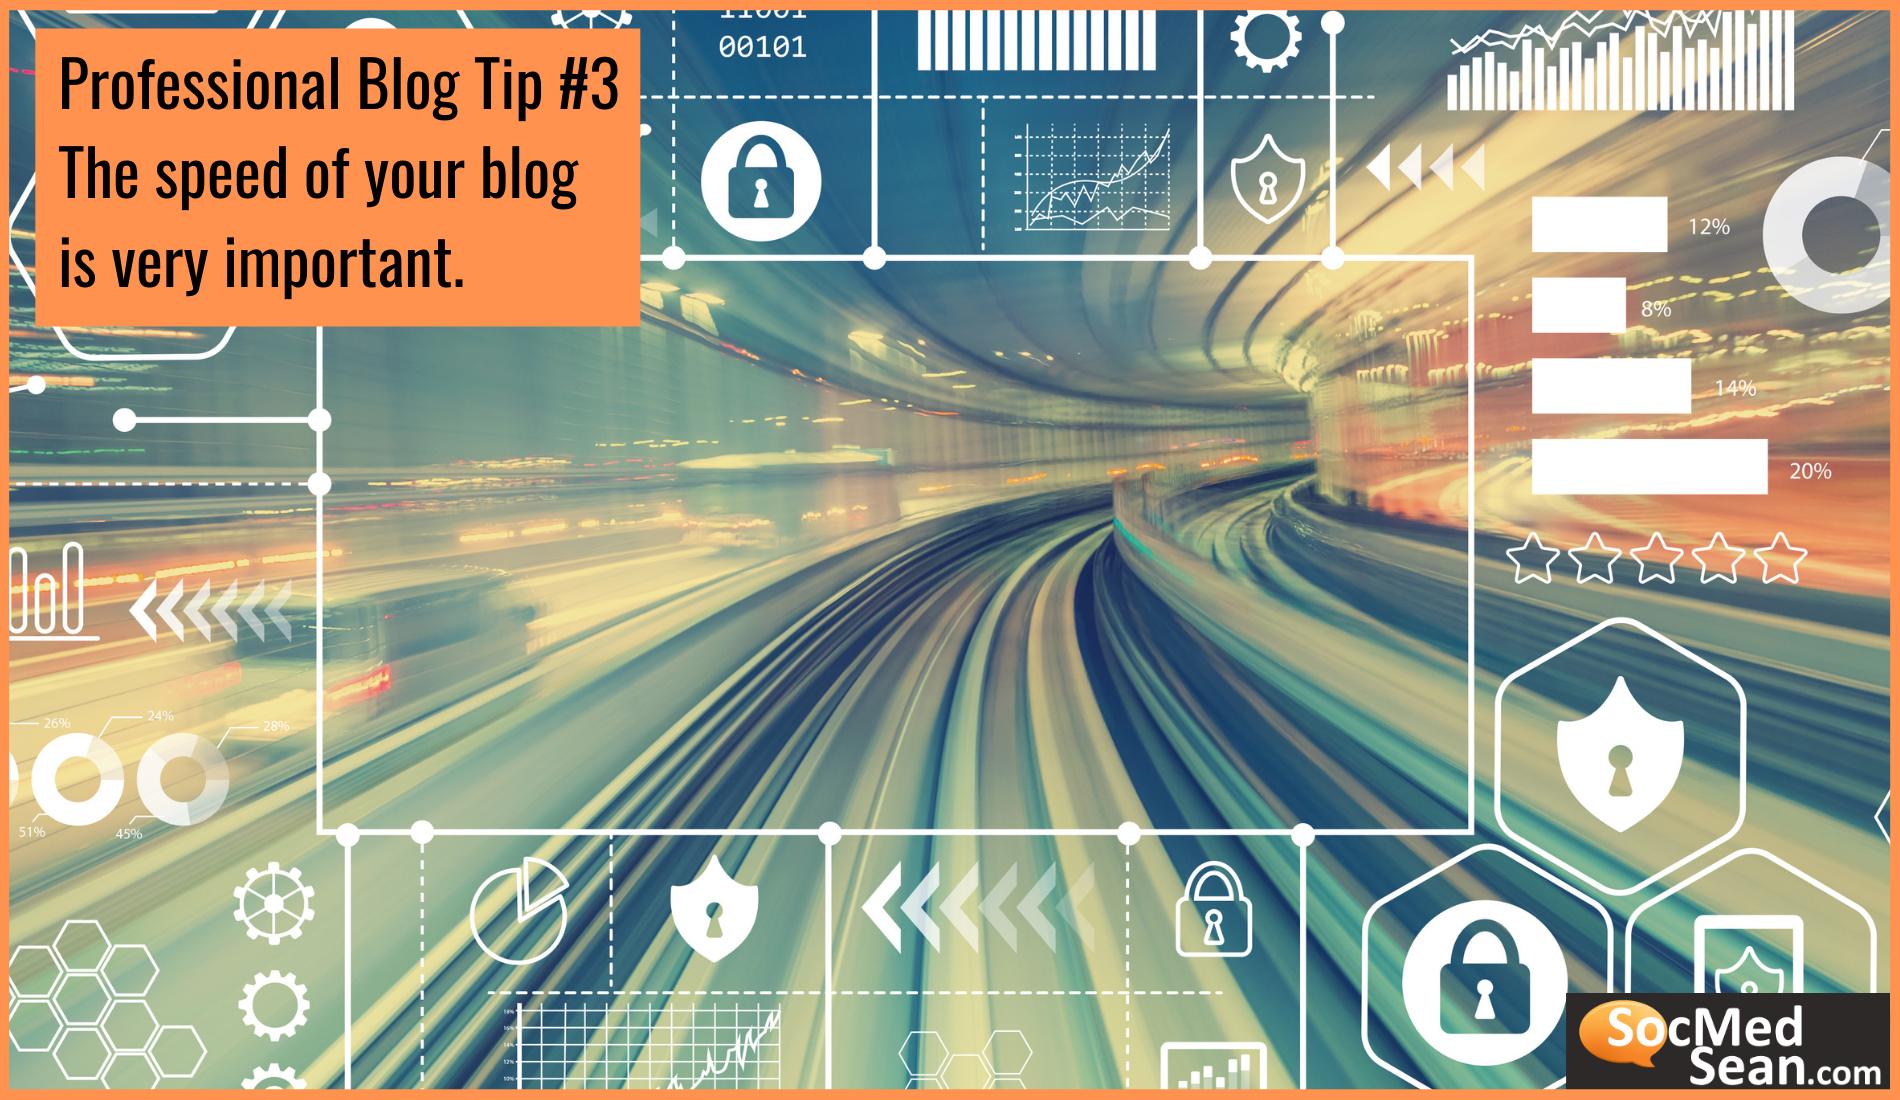 Blogging Tip - Focus on Site Speed